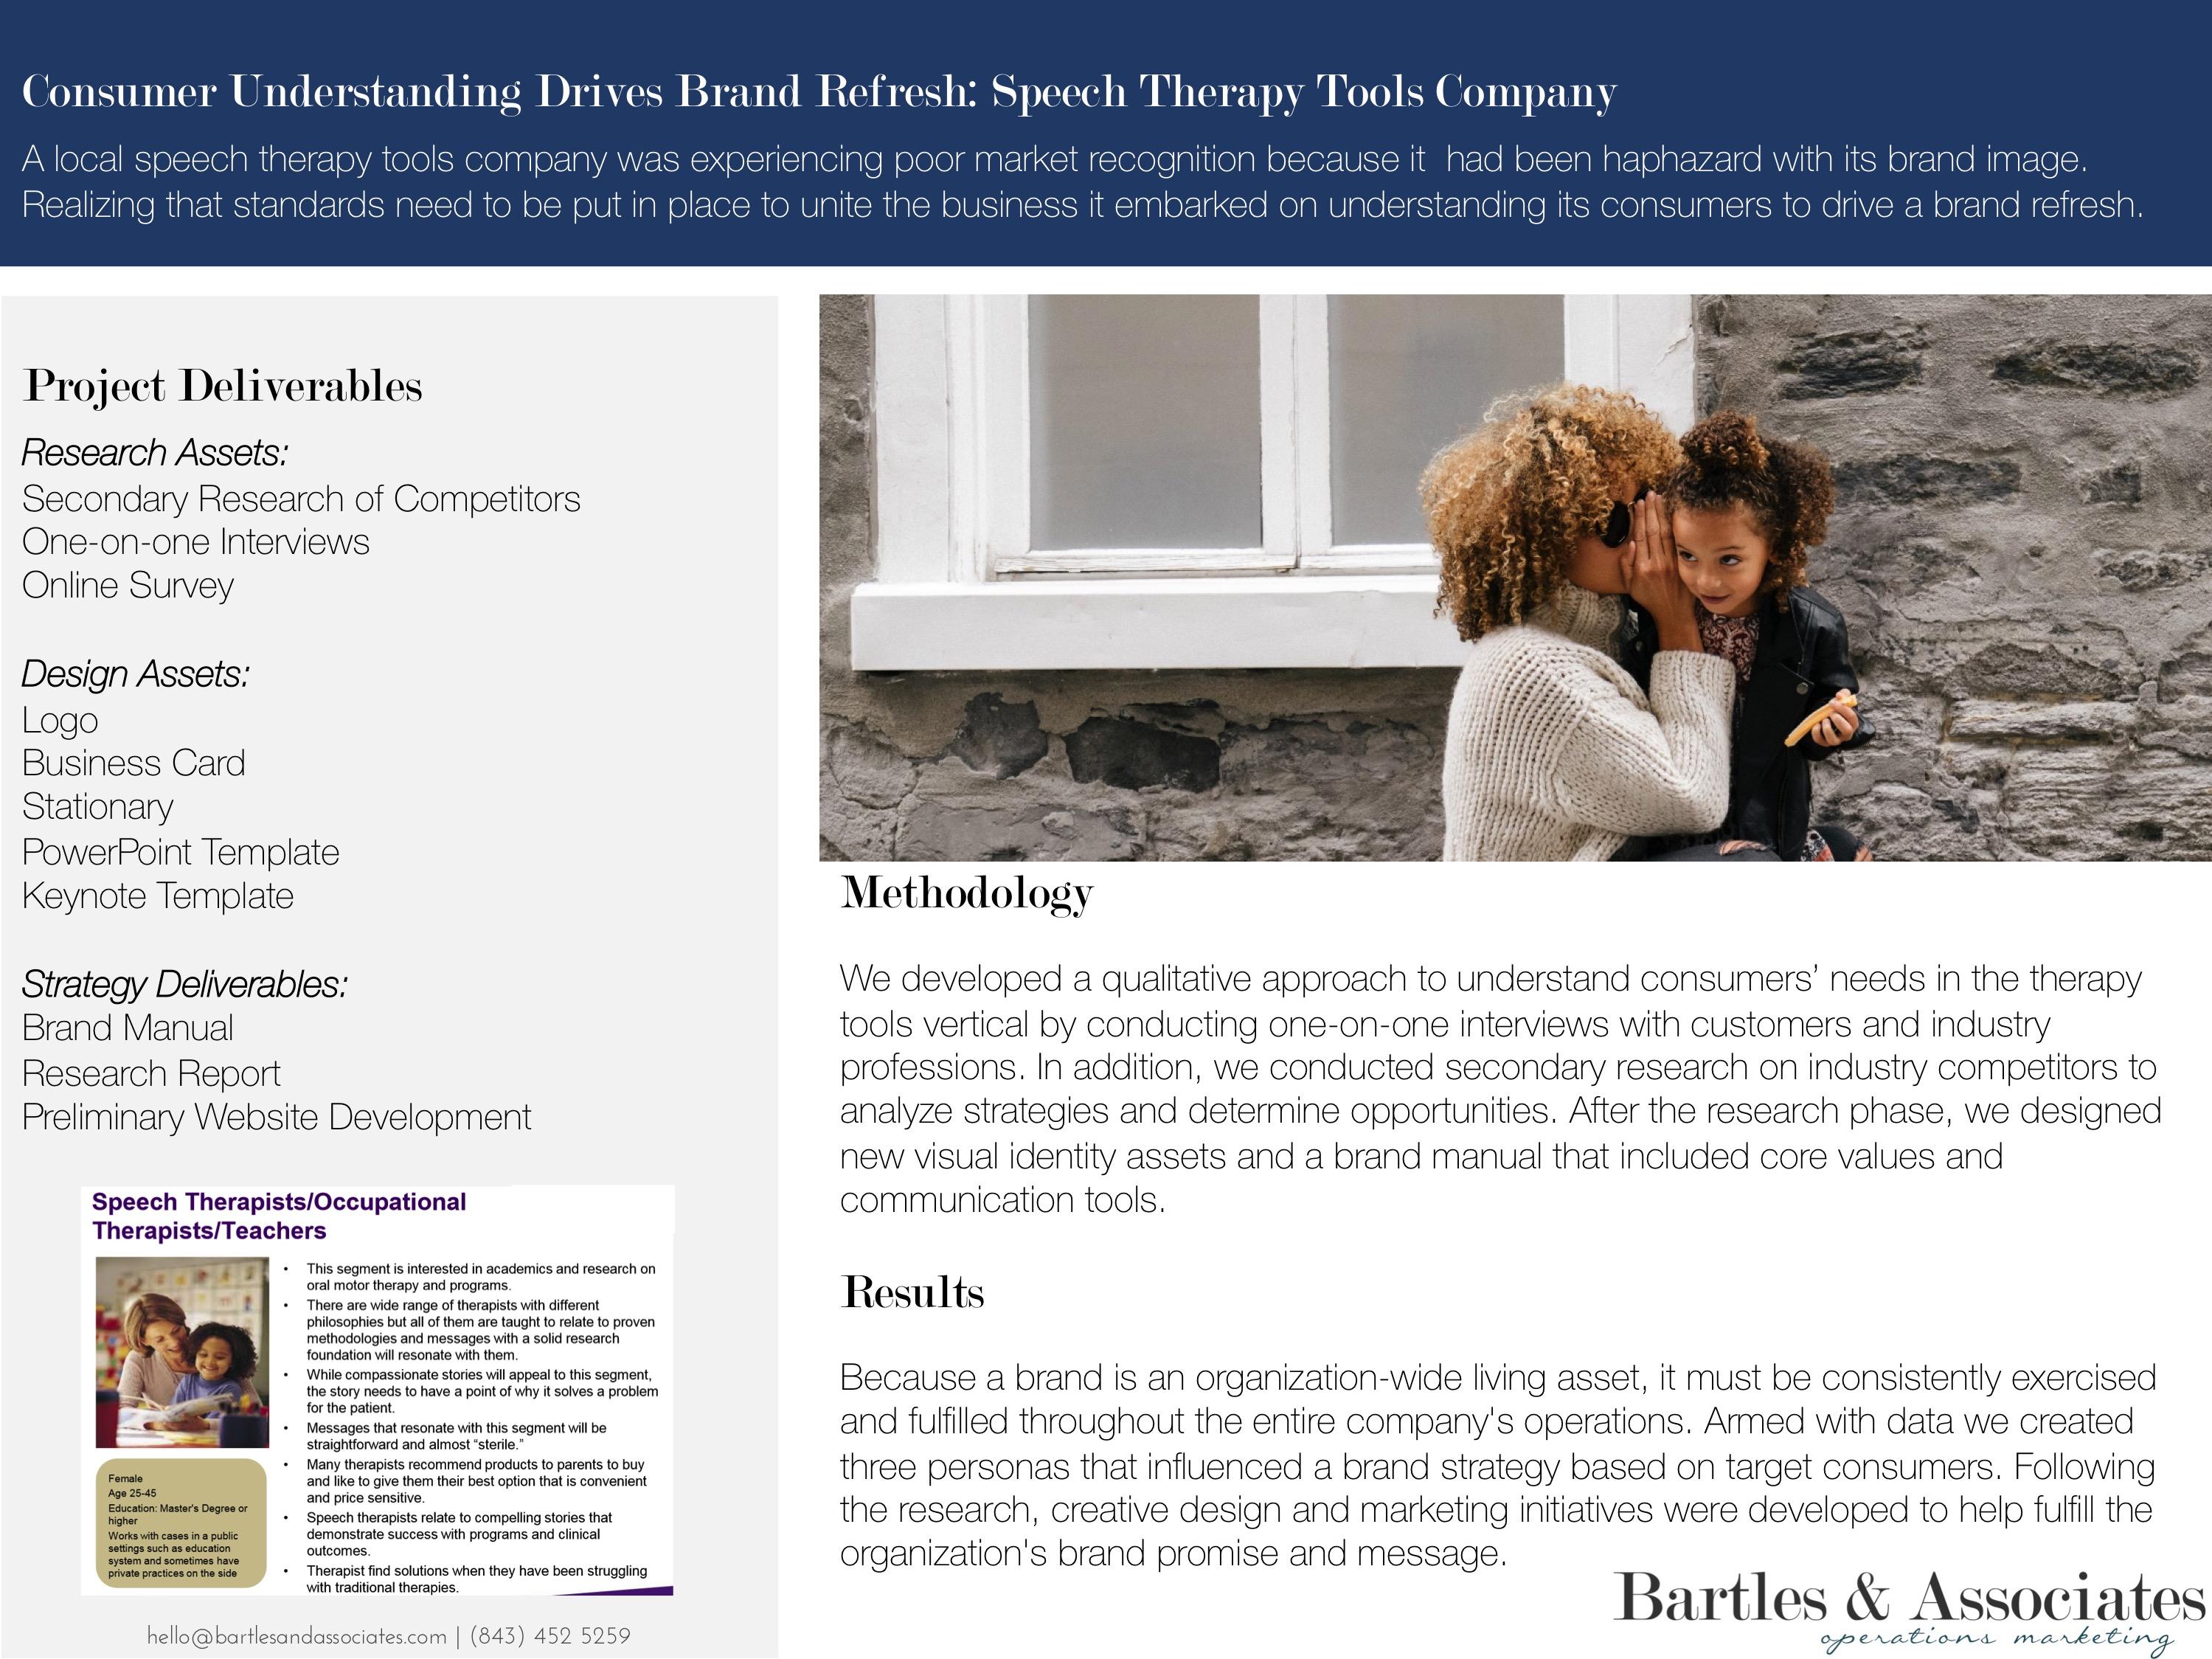 bartles associates brand refresh